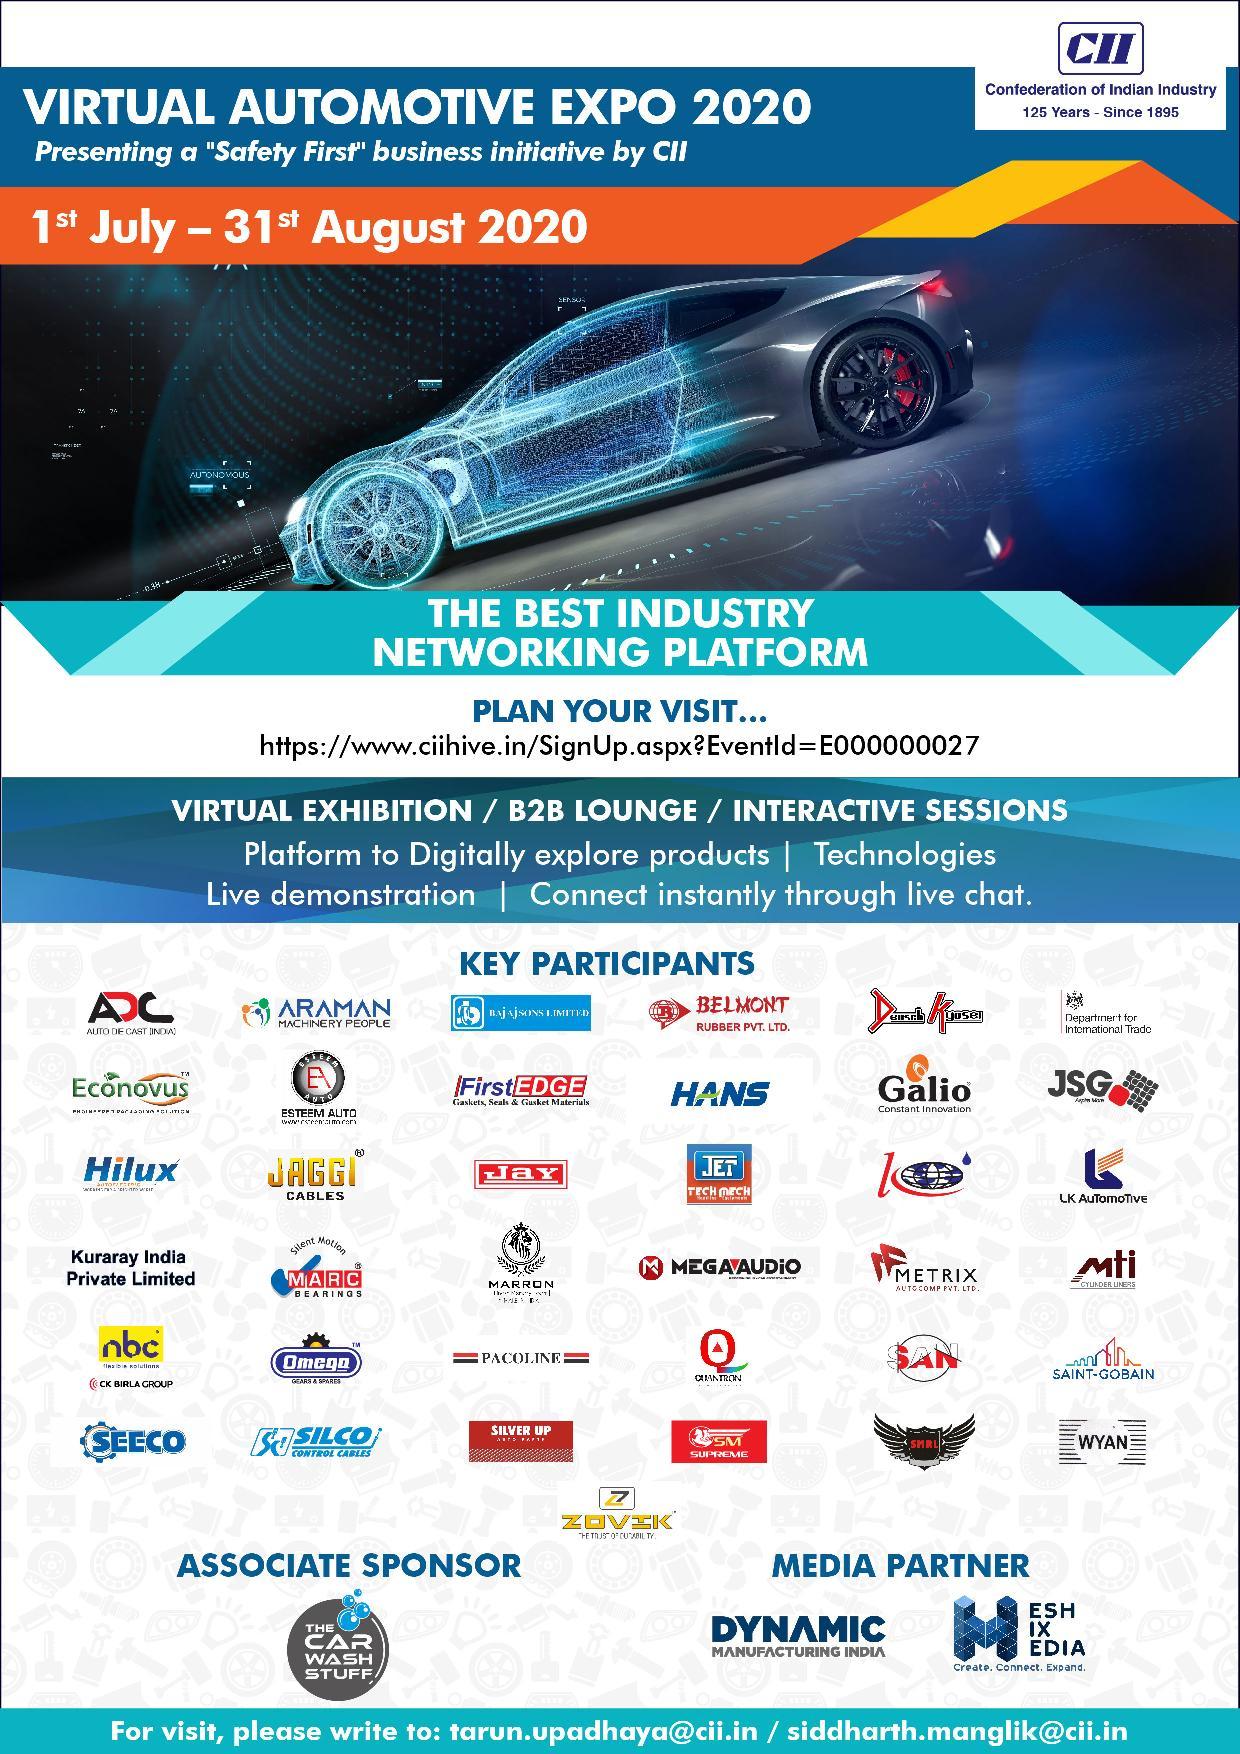 CII_Automotive Visitor Promotion Magazine Ad_210 x 297 mm-01 (2)-page-001